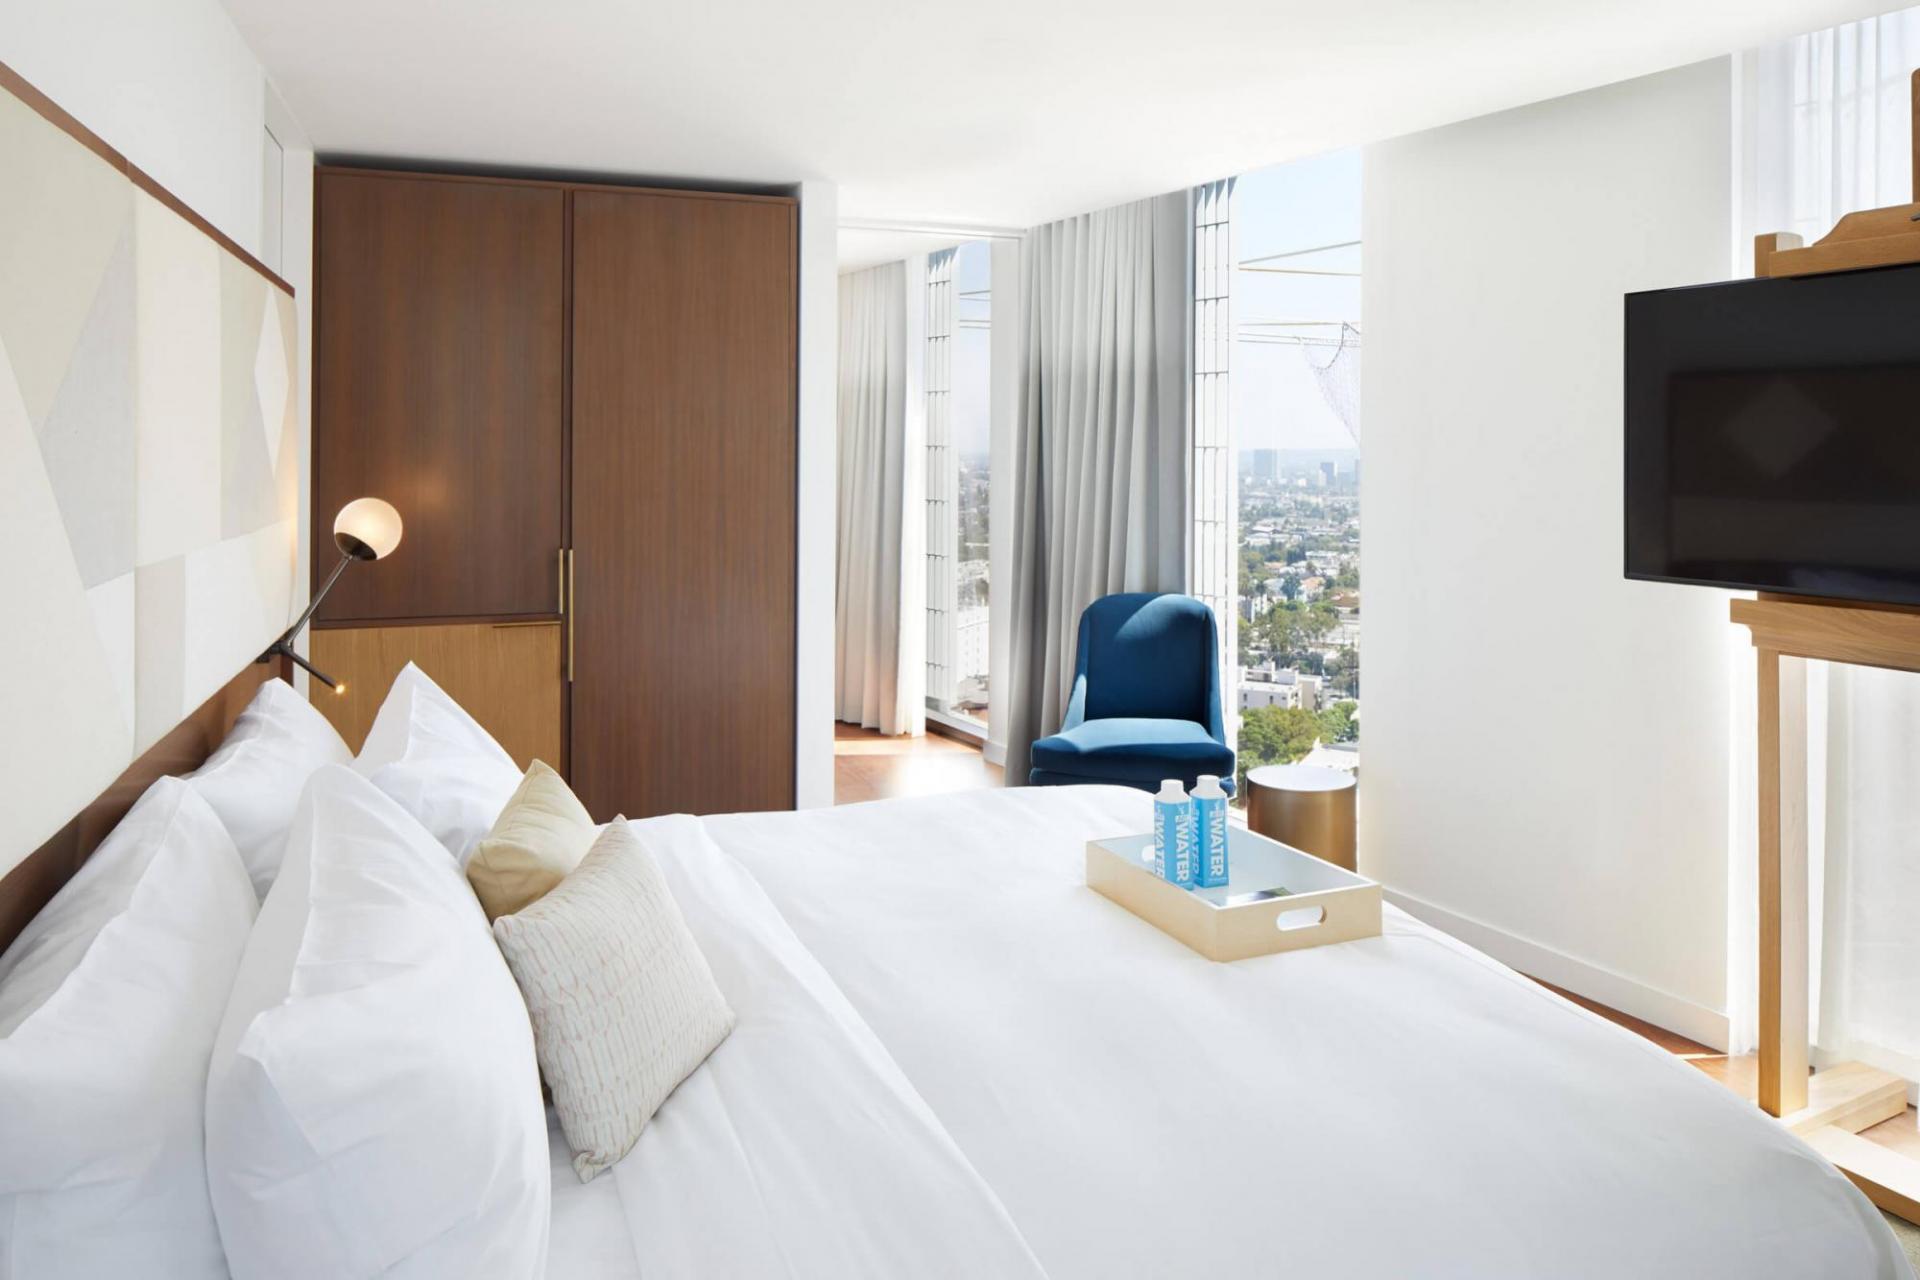 Jeremy Room 1 Bed